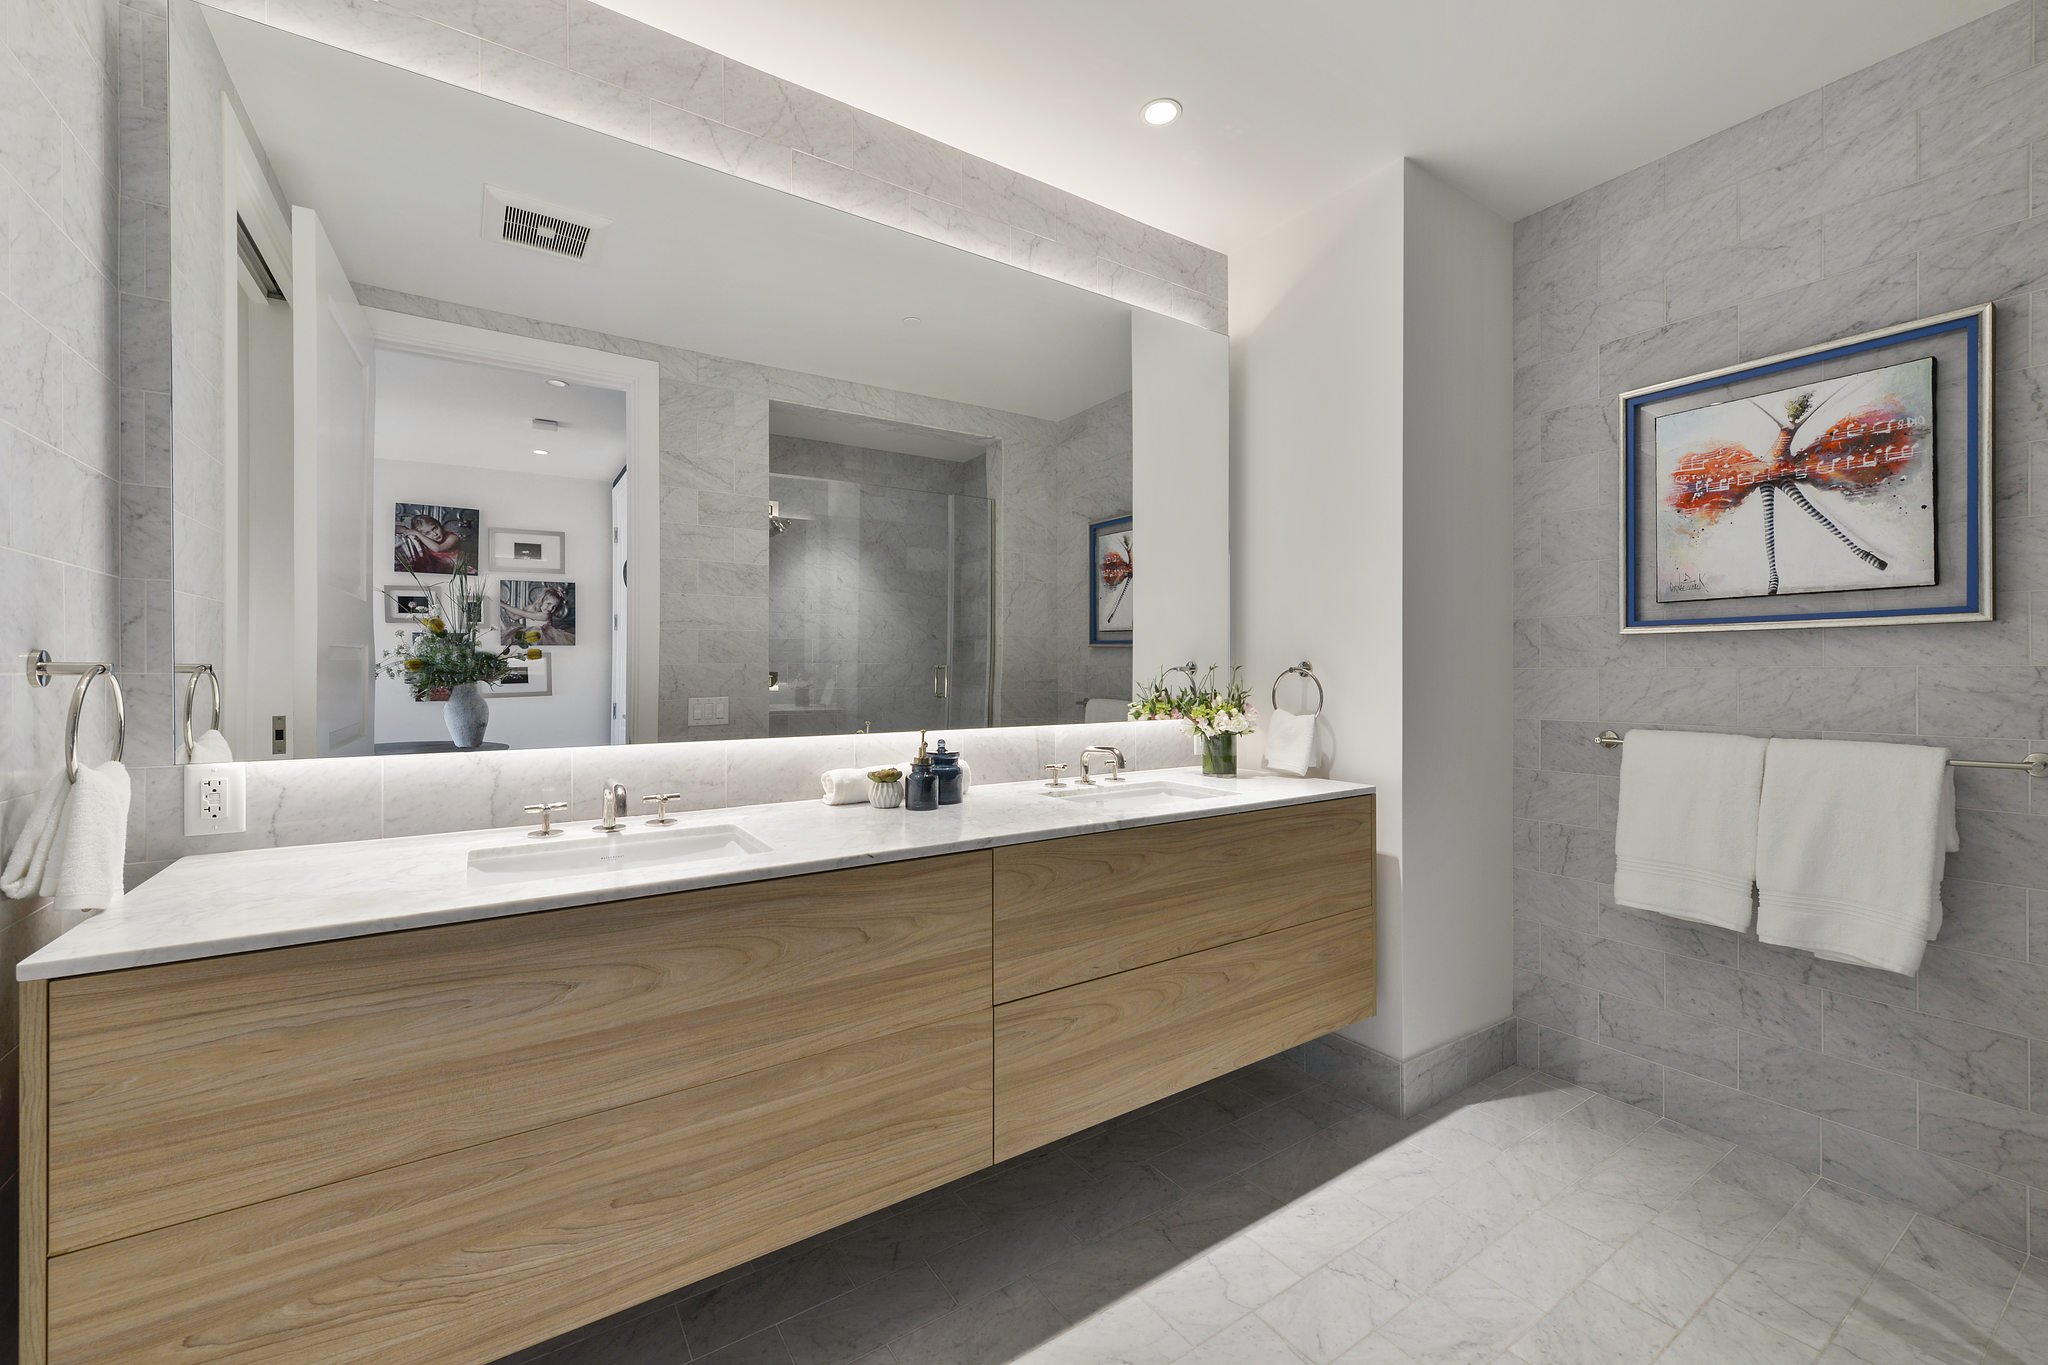 San Francisco Luxury Home - Bathroom